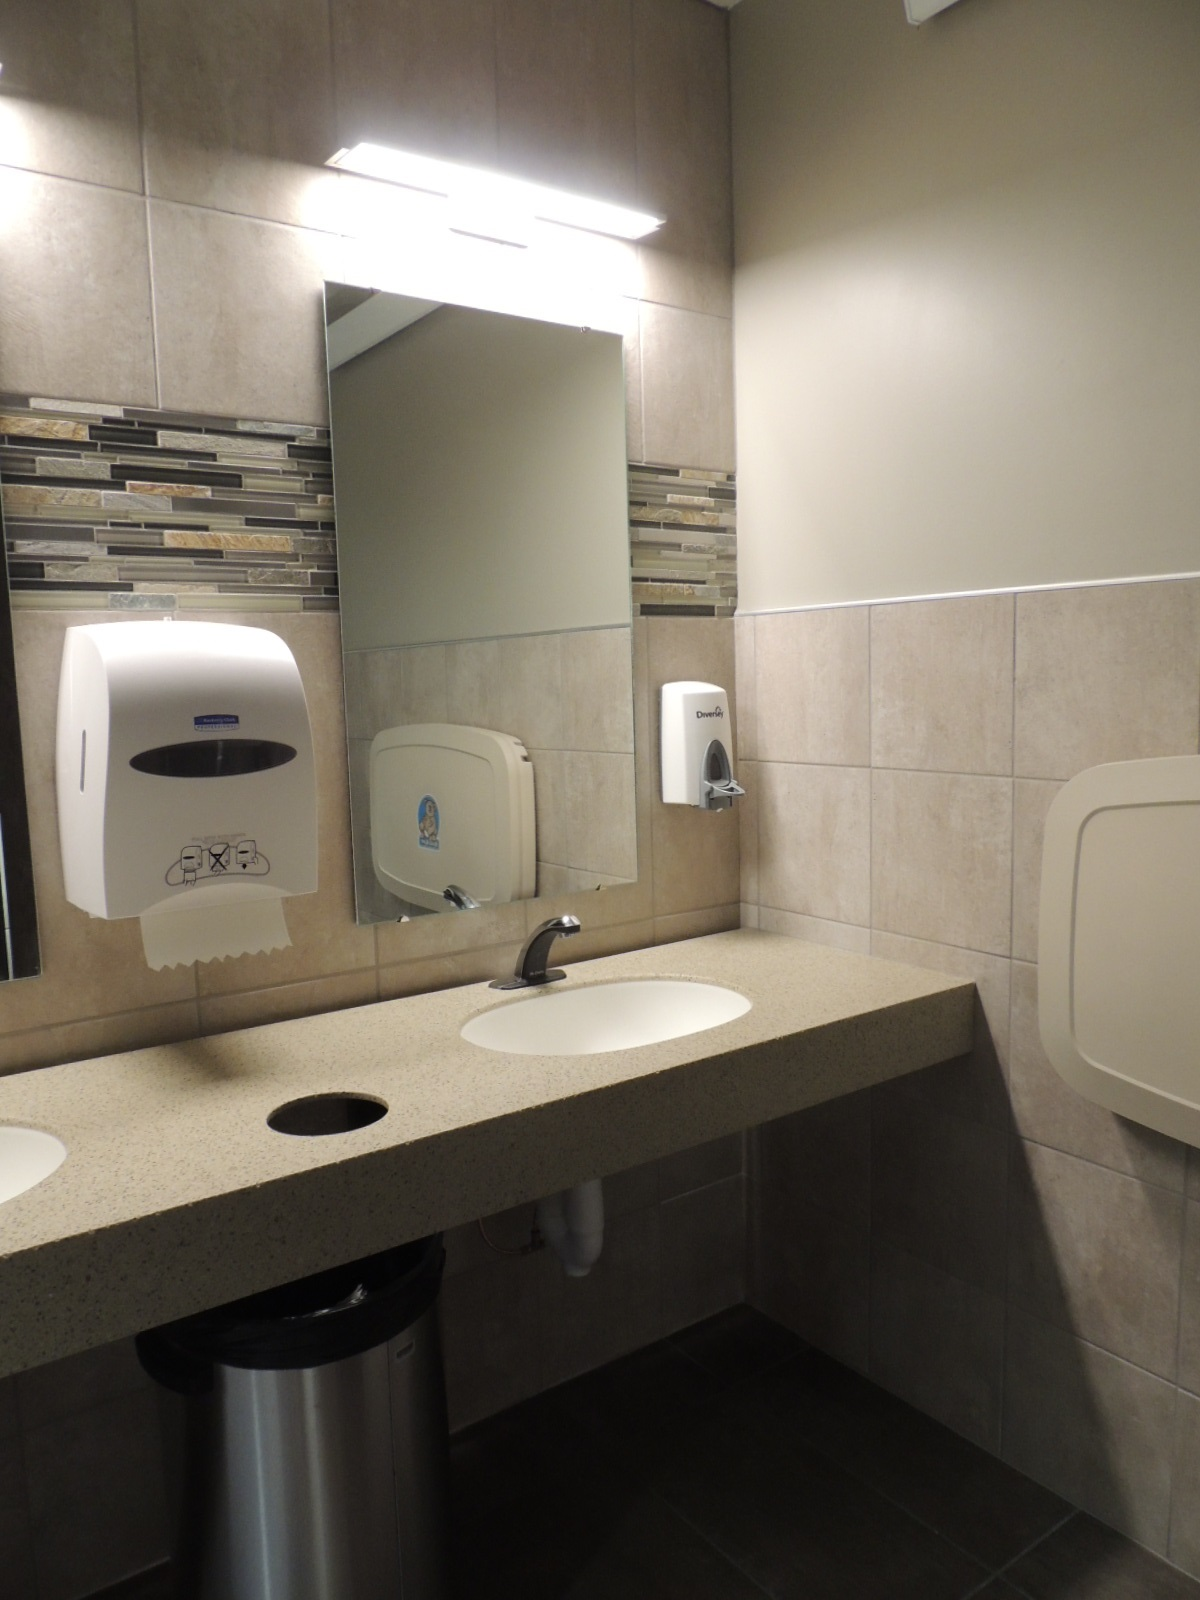 Most Posh restrooms award goes to new HyVeeGreene